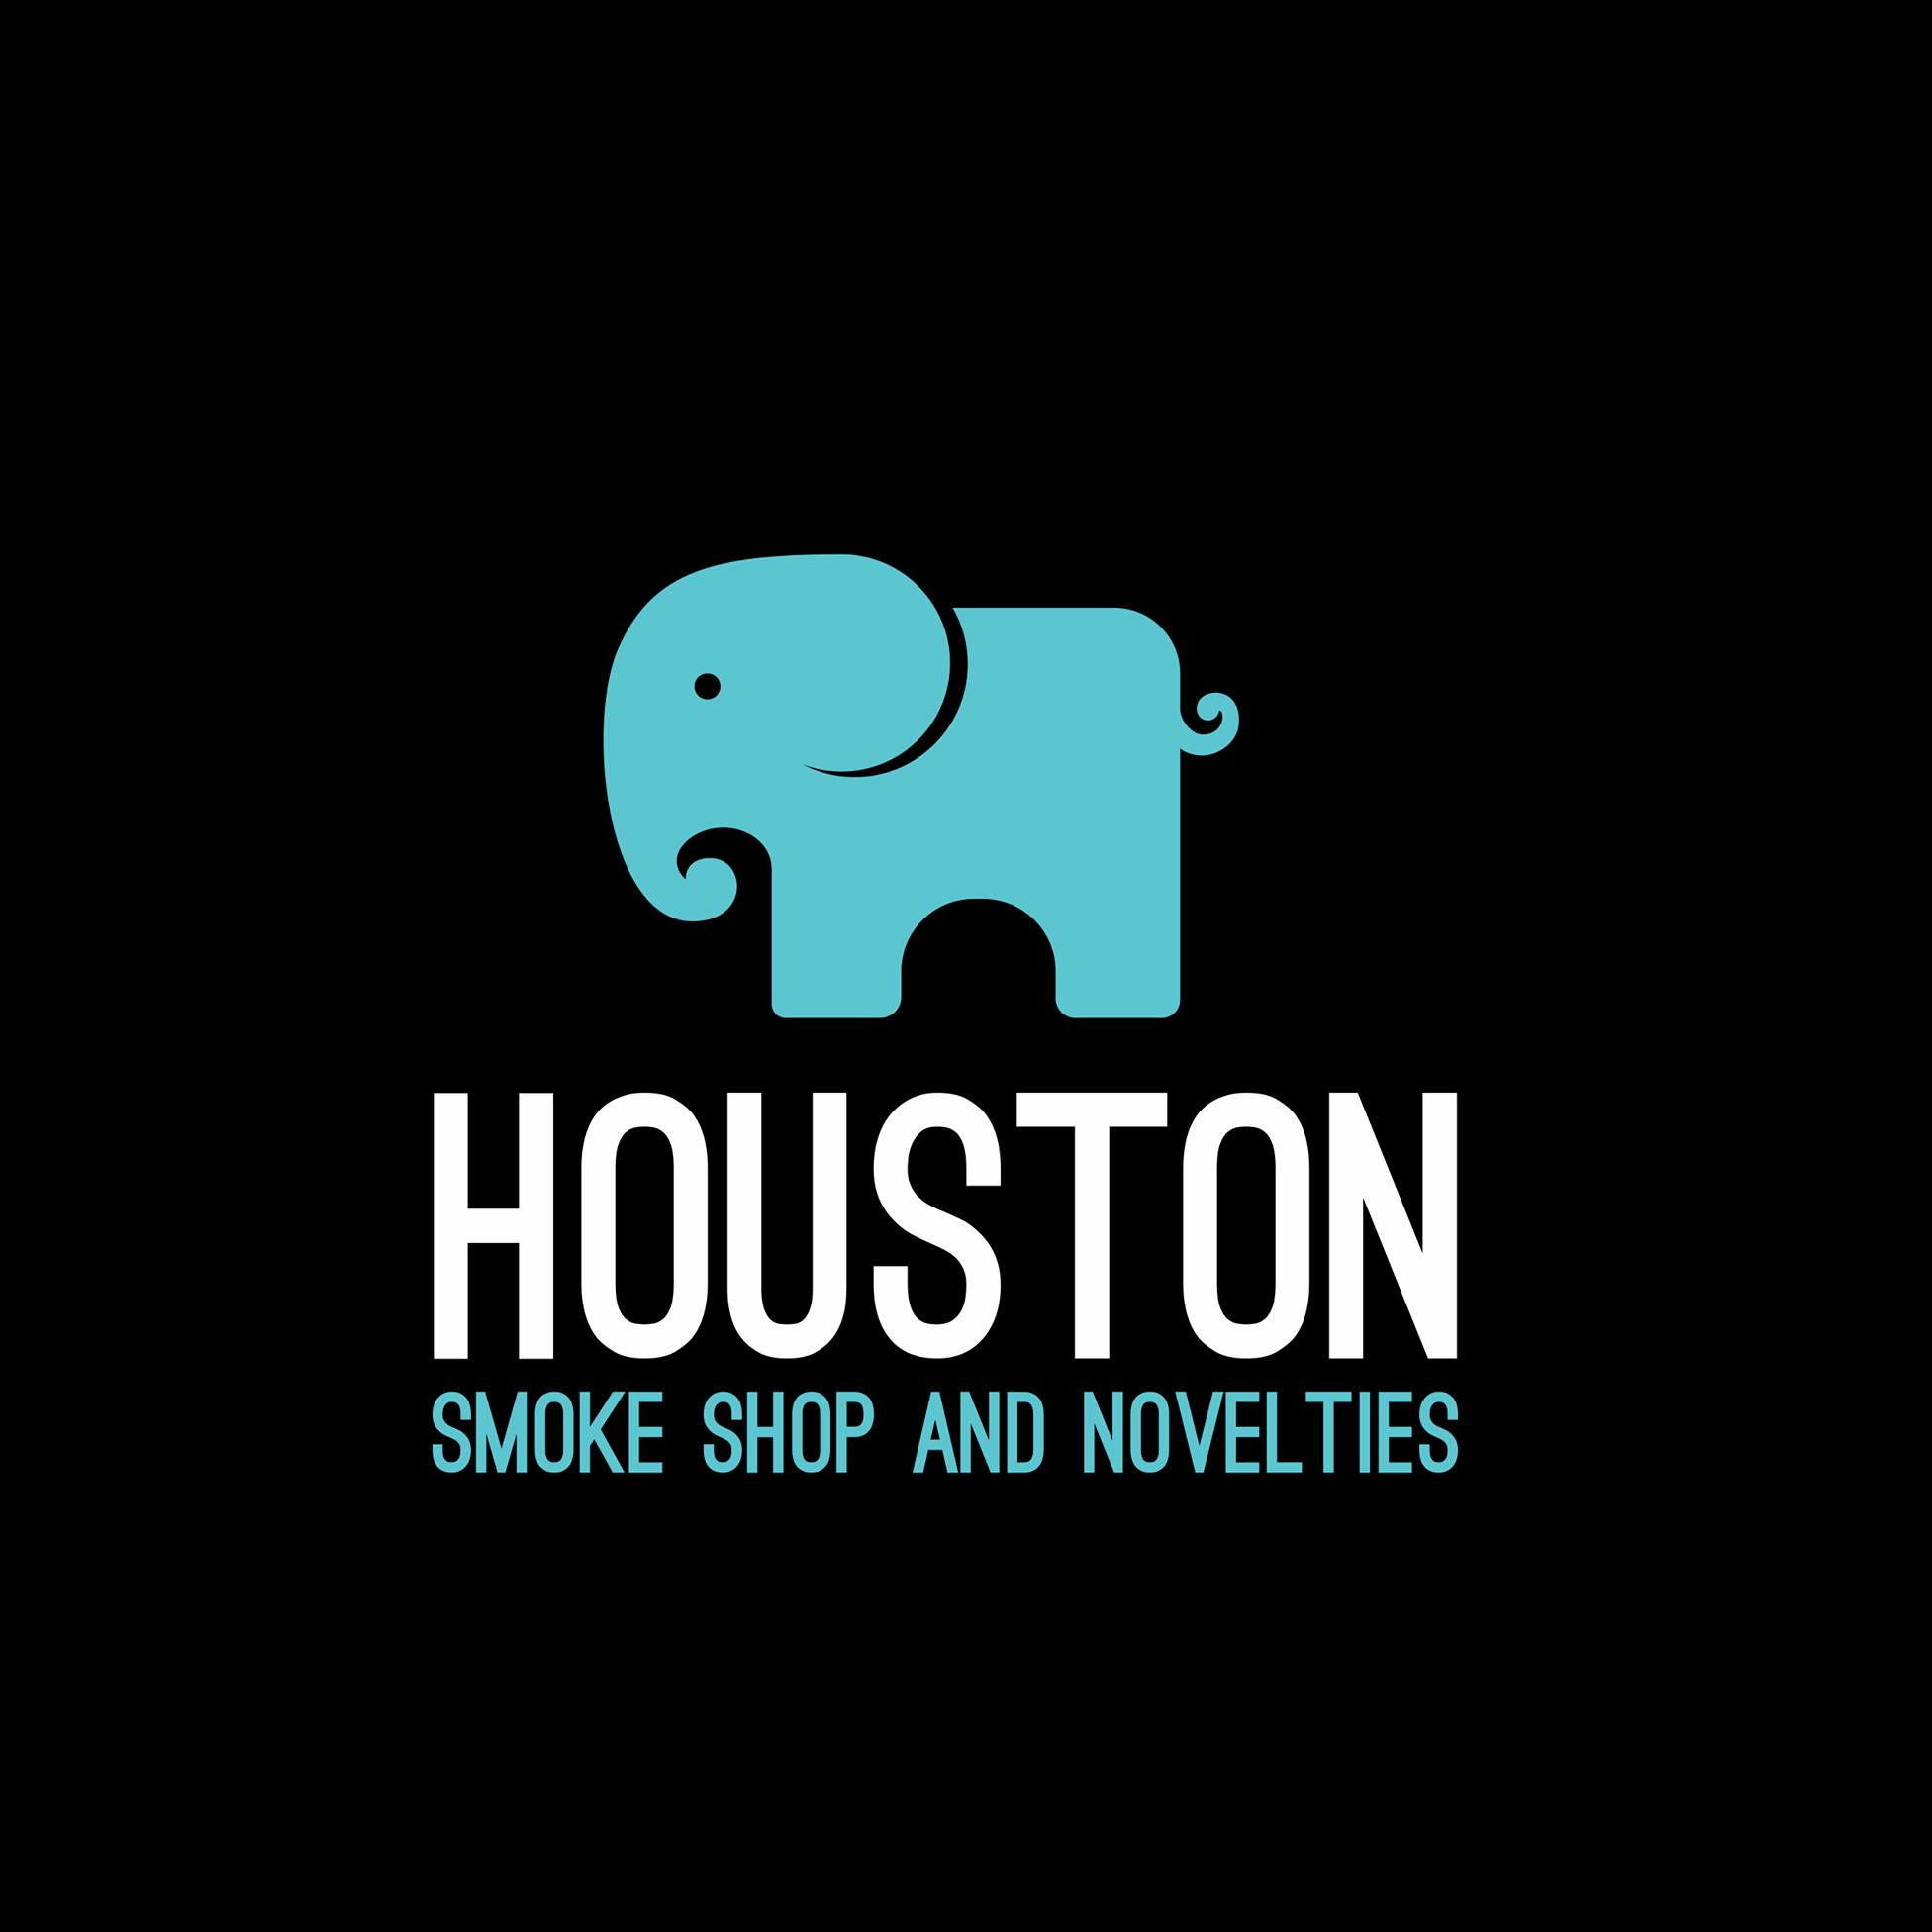 Houston Smoke Shop and Novelties